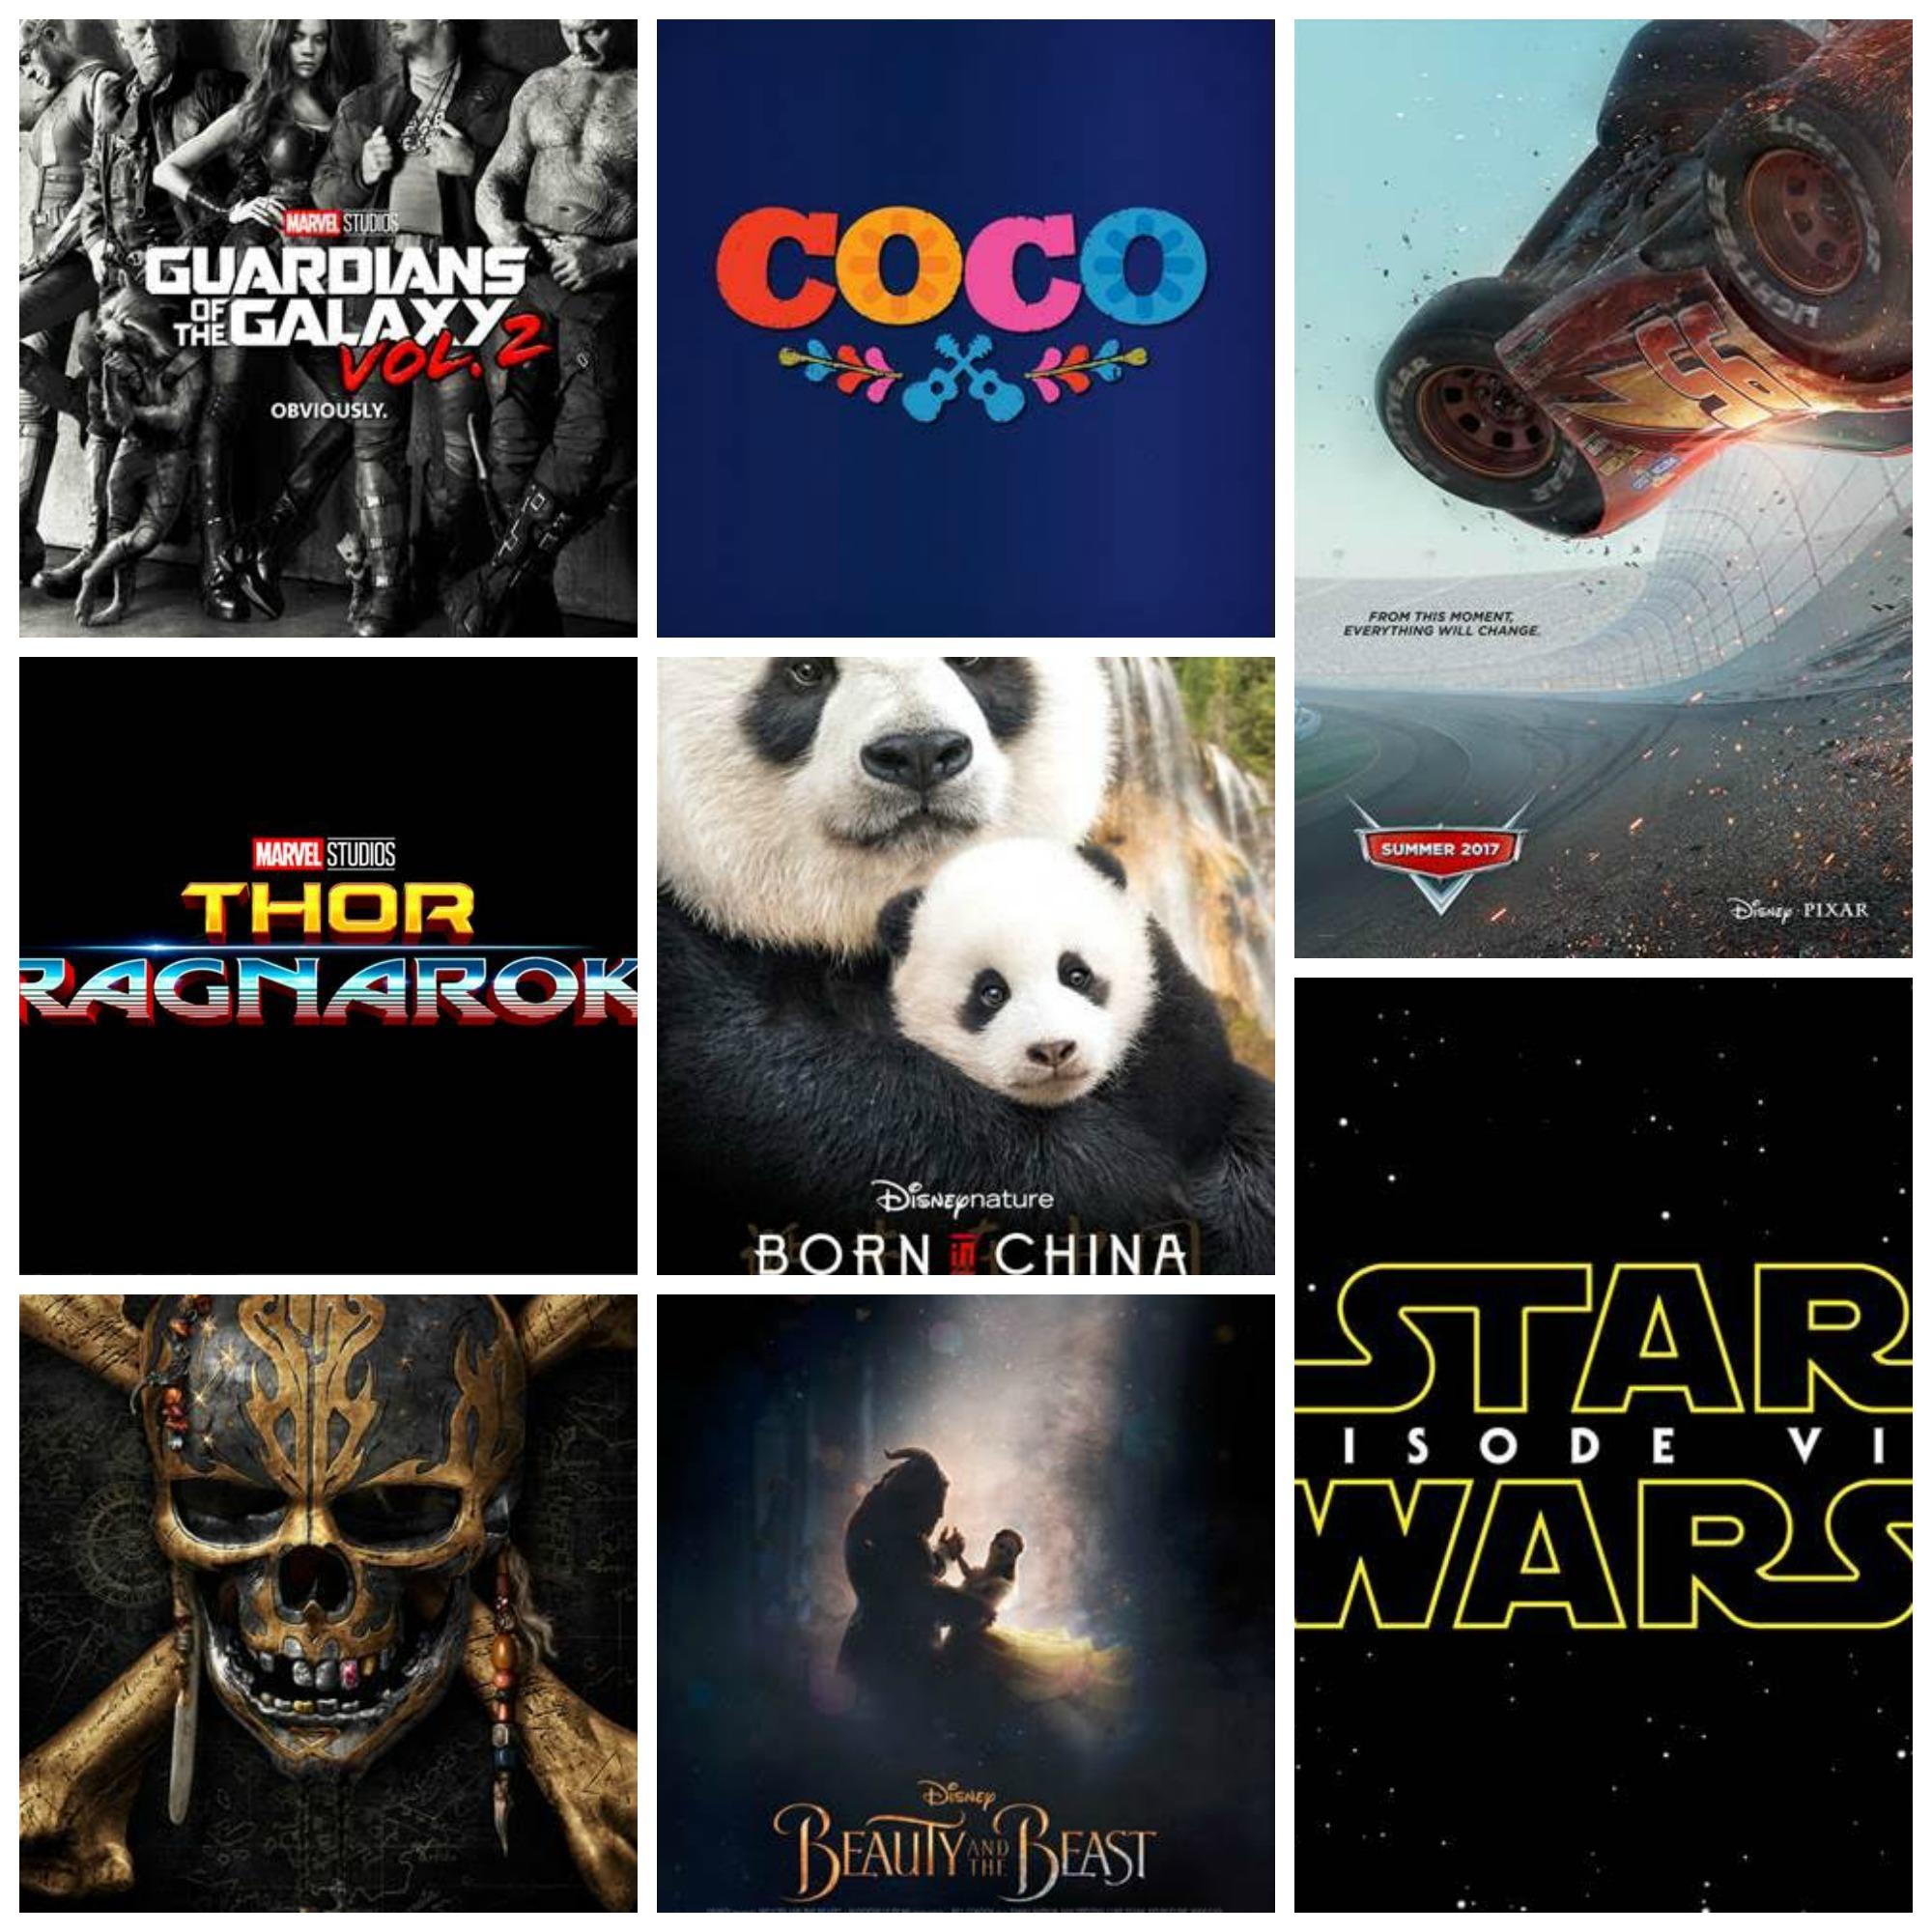 Your 2017 Walt Disney Movies